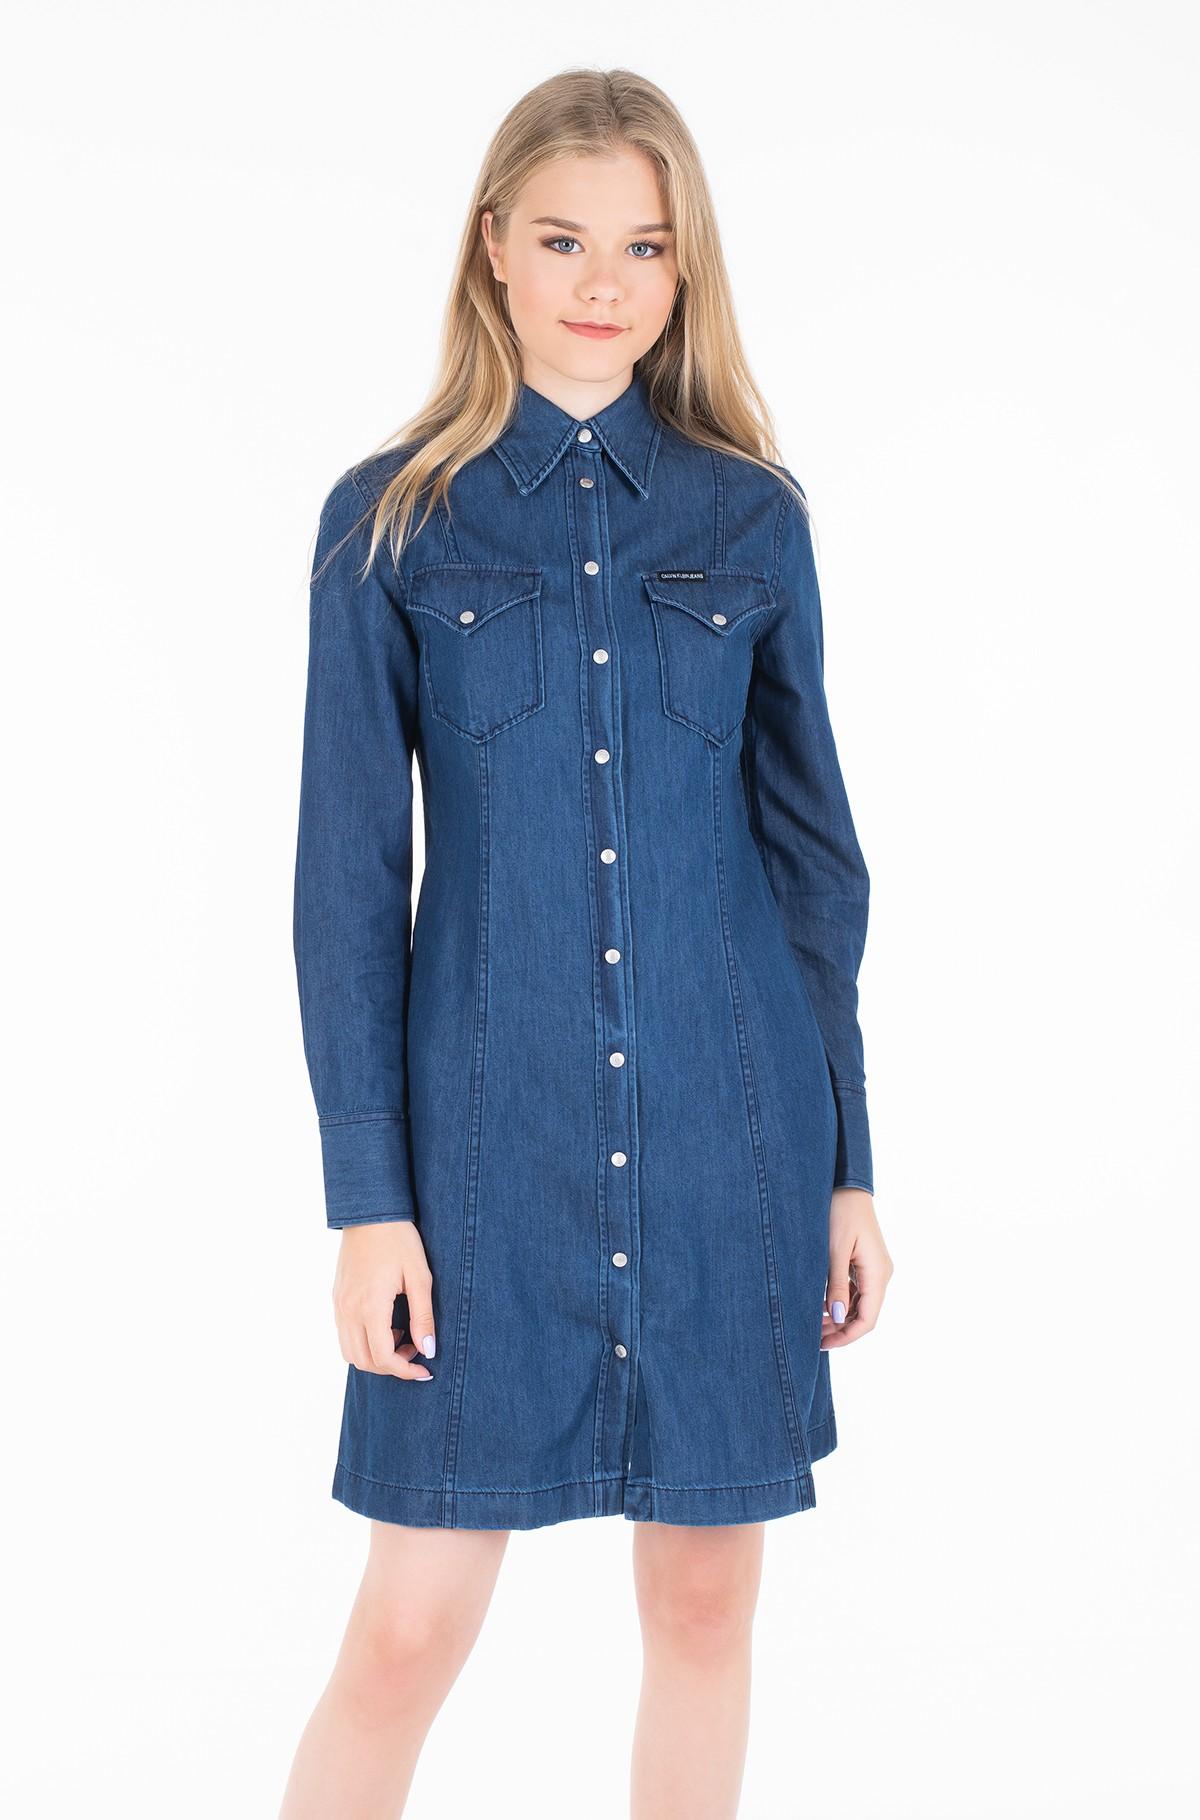 Džinsu kleita WESTERN INDIGO DRESS-full-1